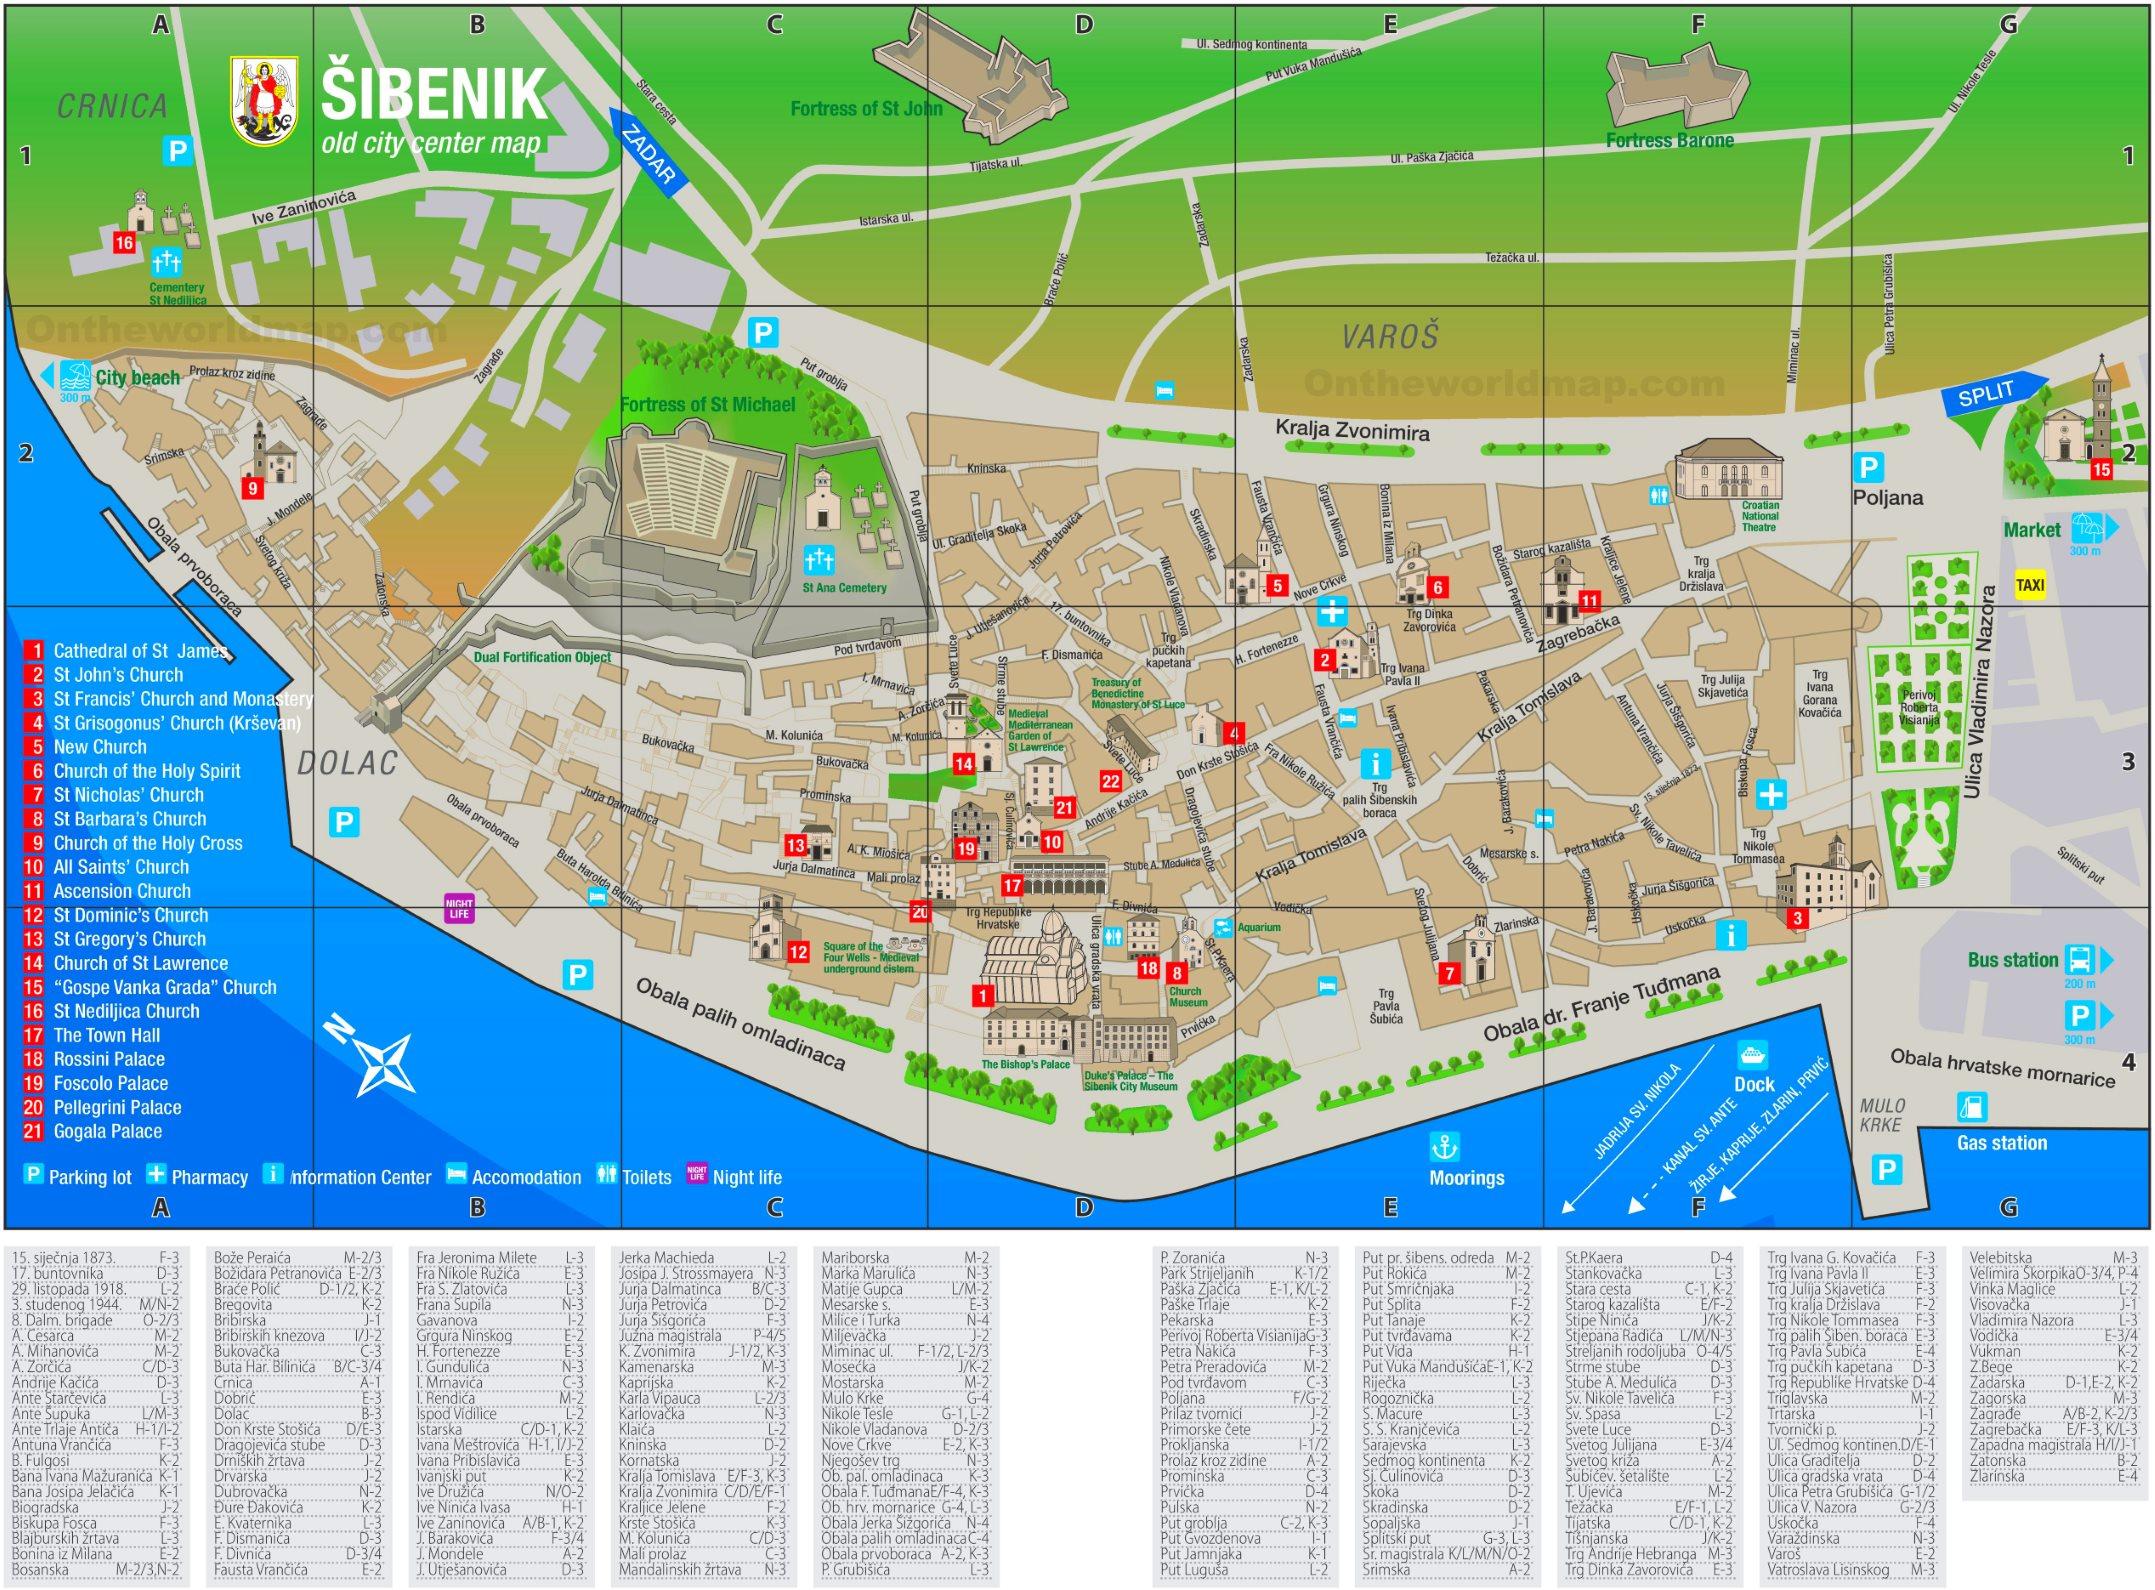 sibenik-tourist-map.jpg